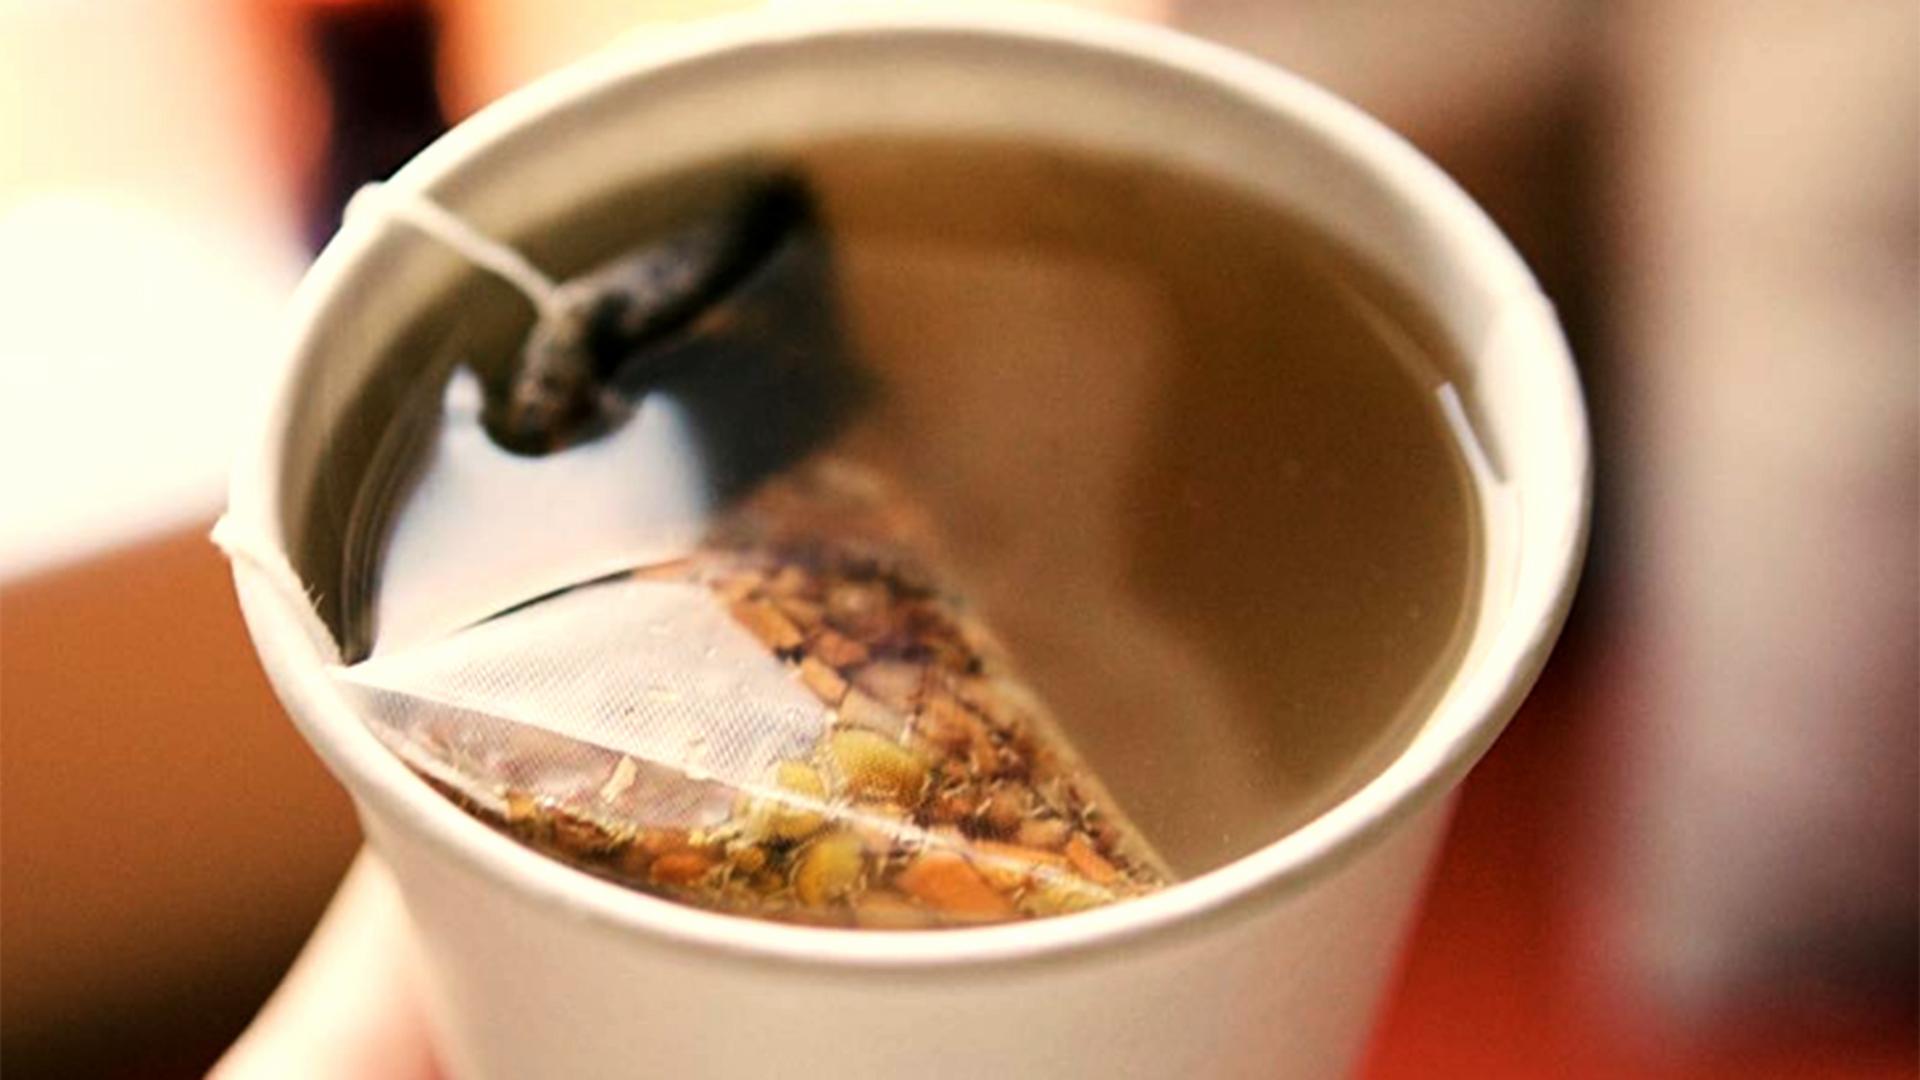 Best Drink At Starbucks For Sore Throat